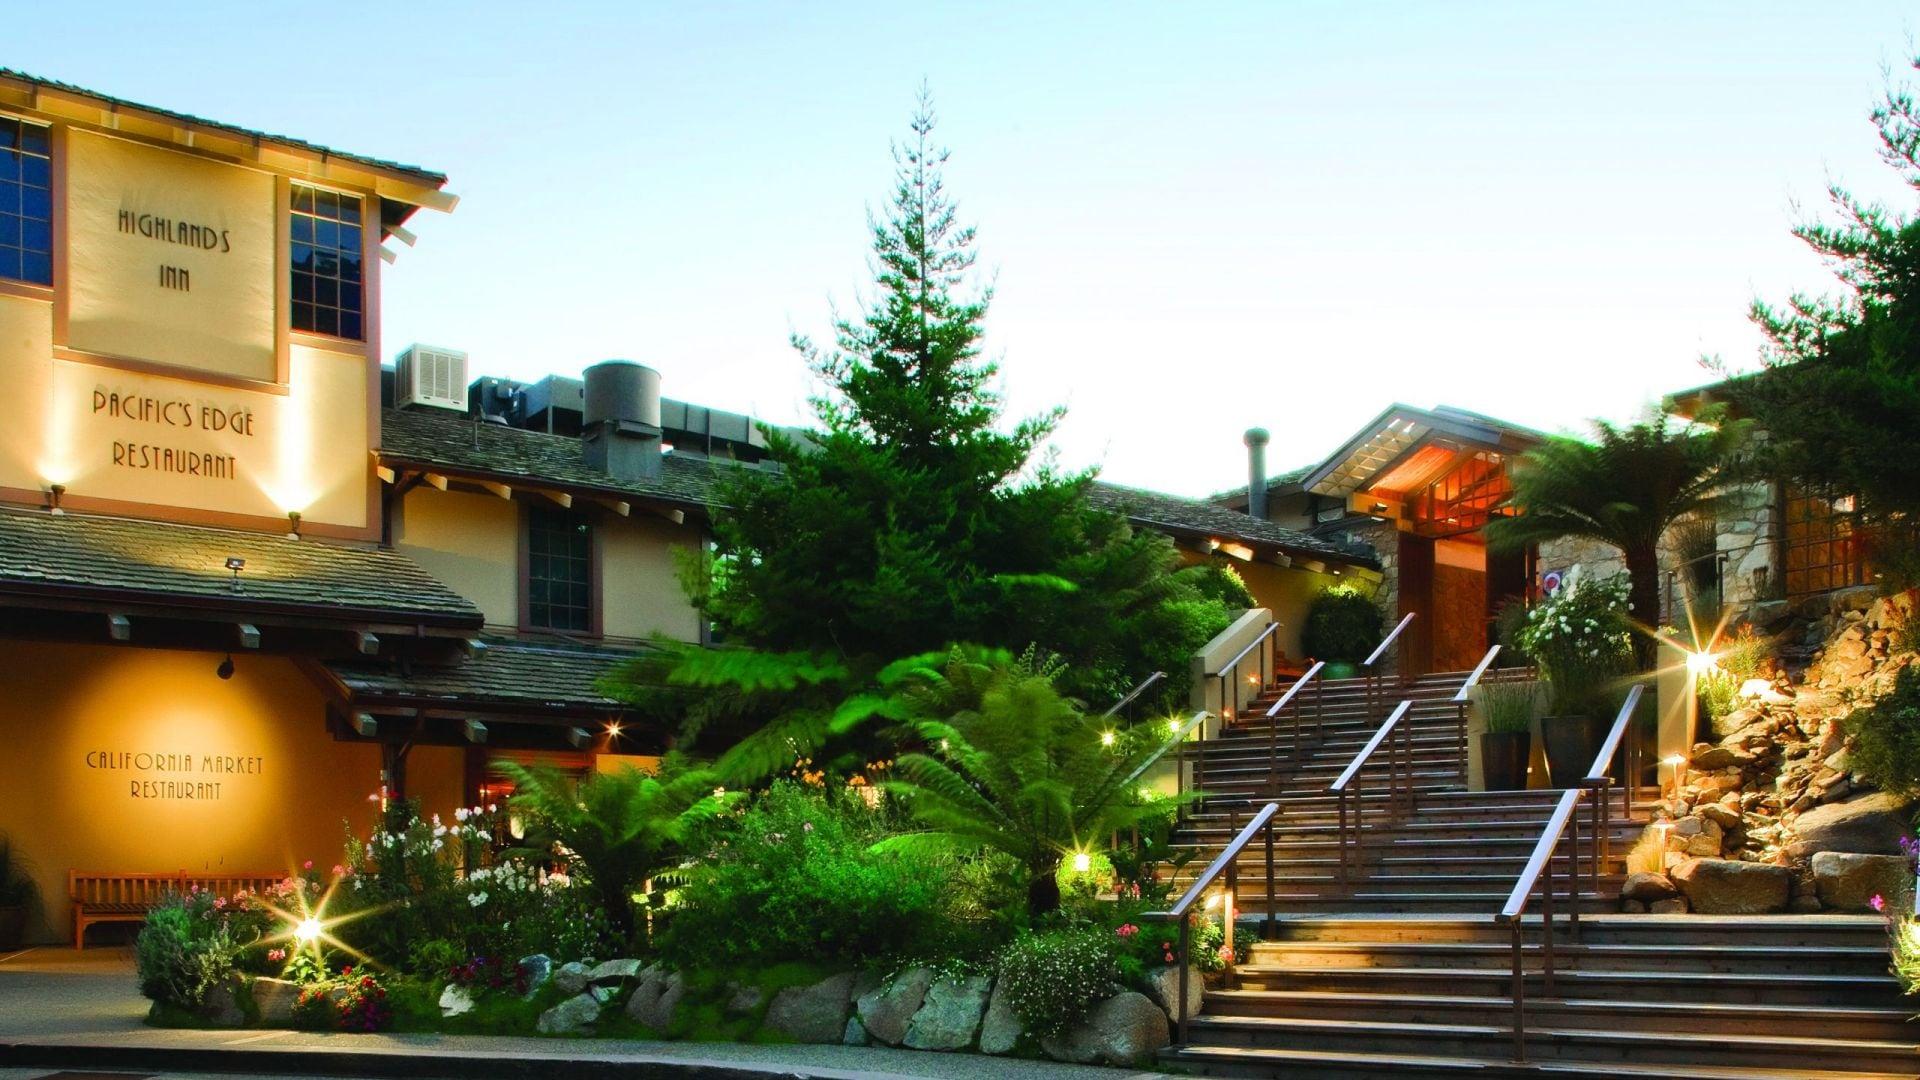 Highlands Inn, a Hyatt Hotel